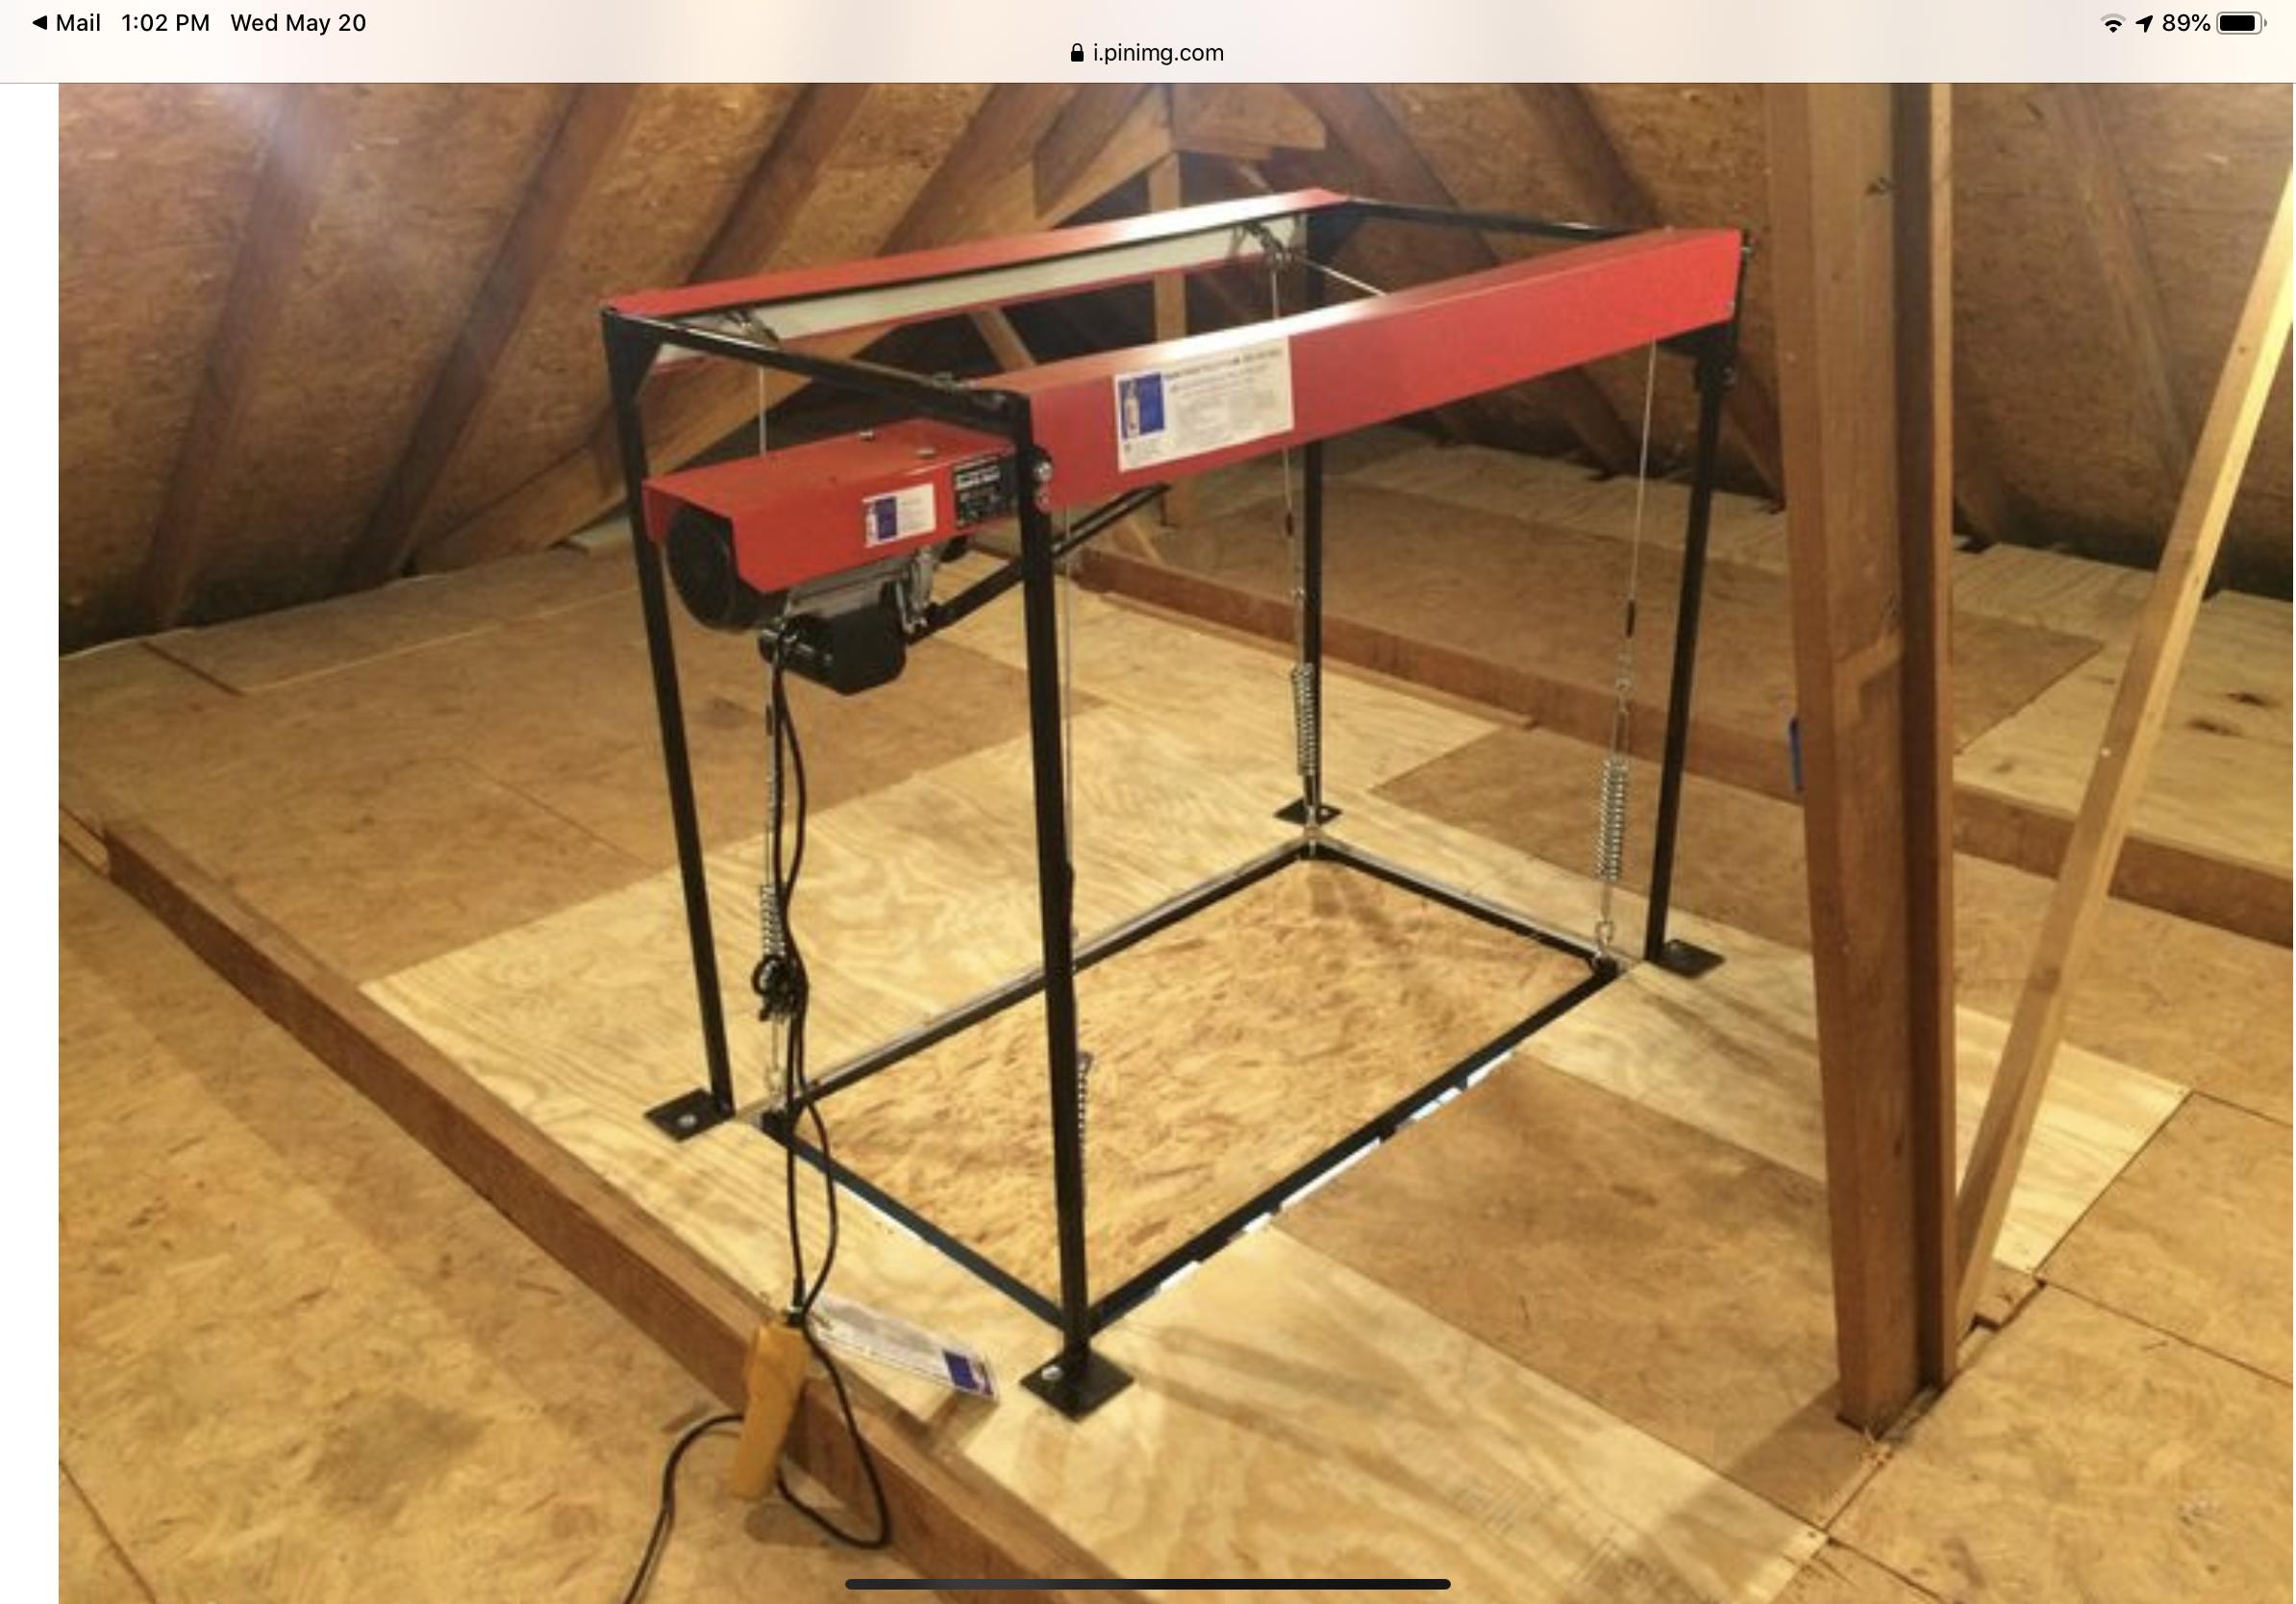 Pin by Darla WhippleFrain on Garage Loft Lift in 2020